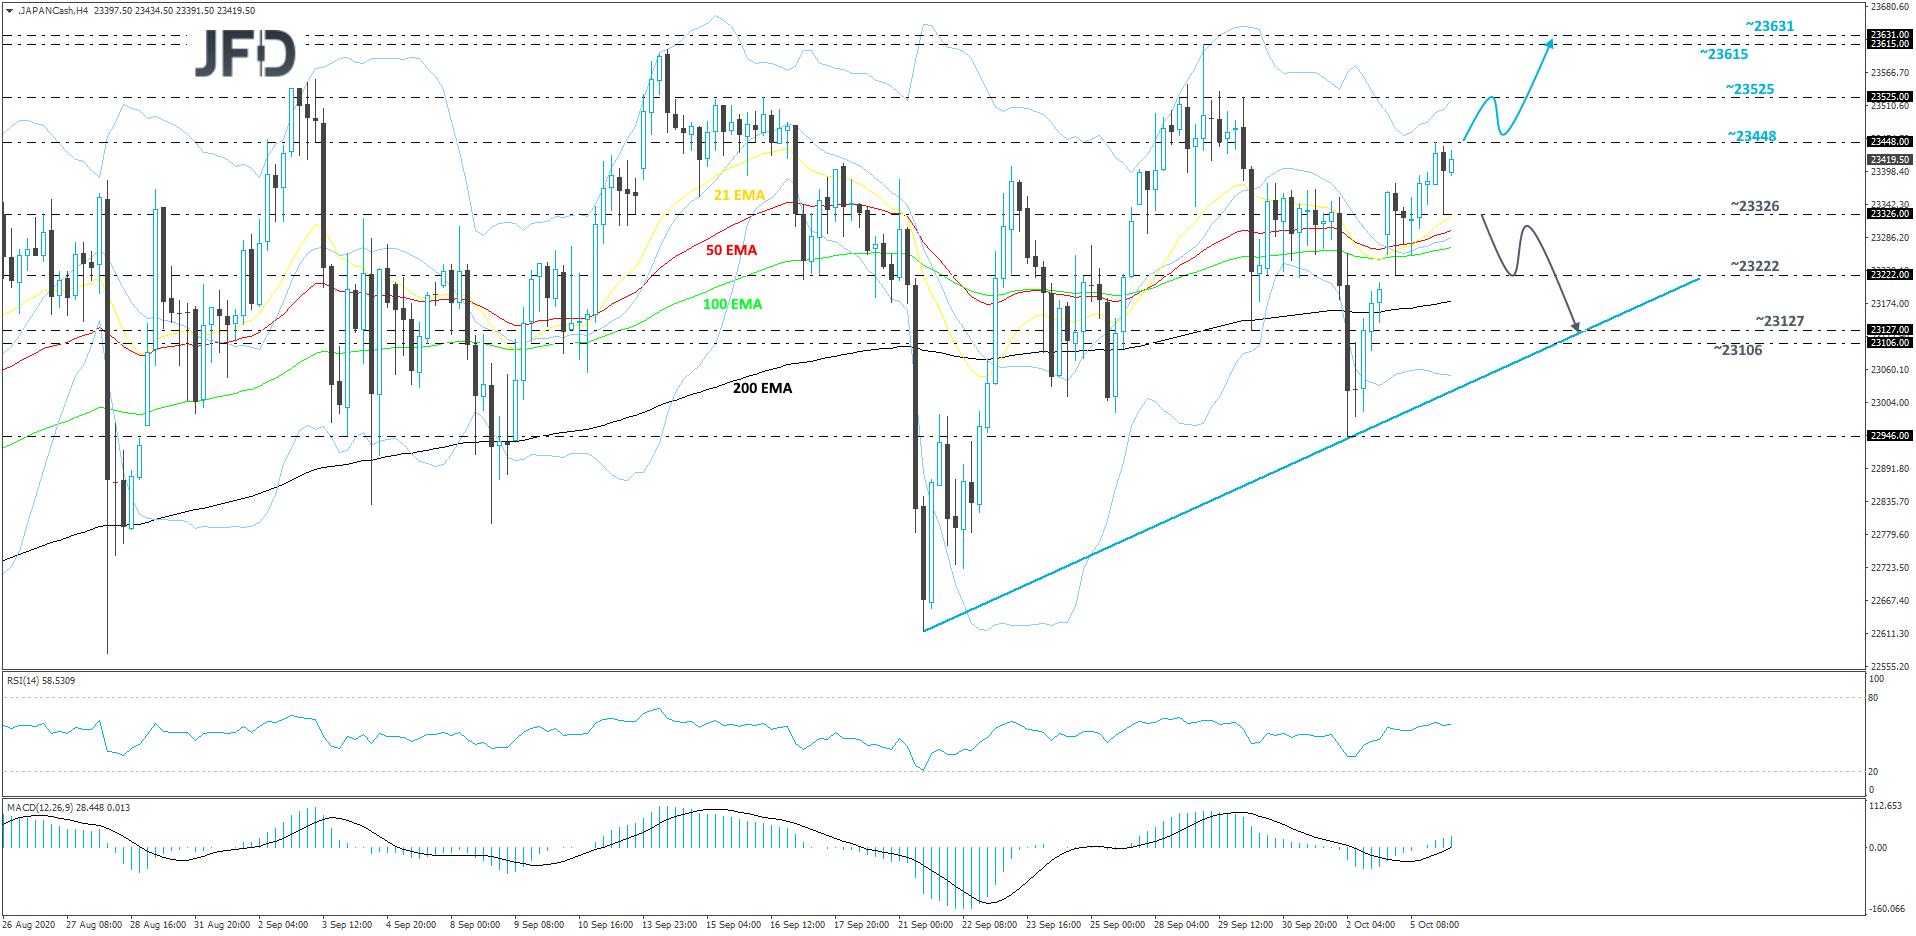 Nikkei 225 4-hour chart technical analysis